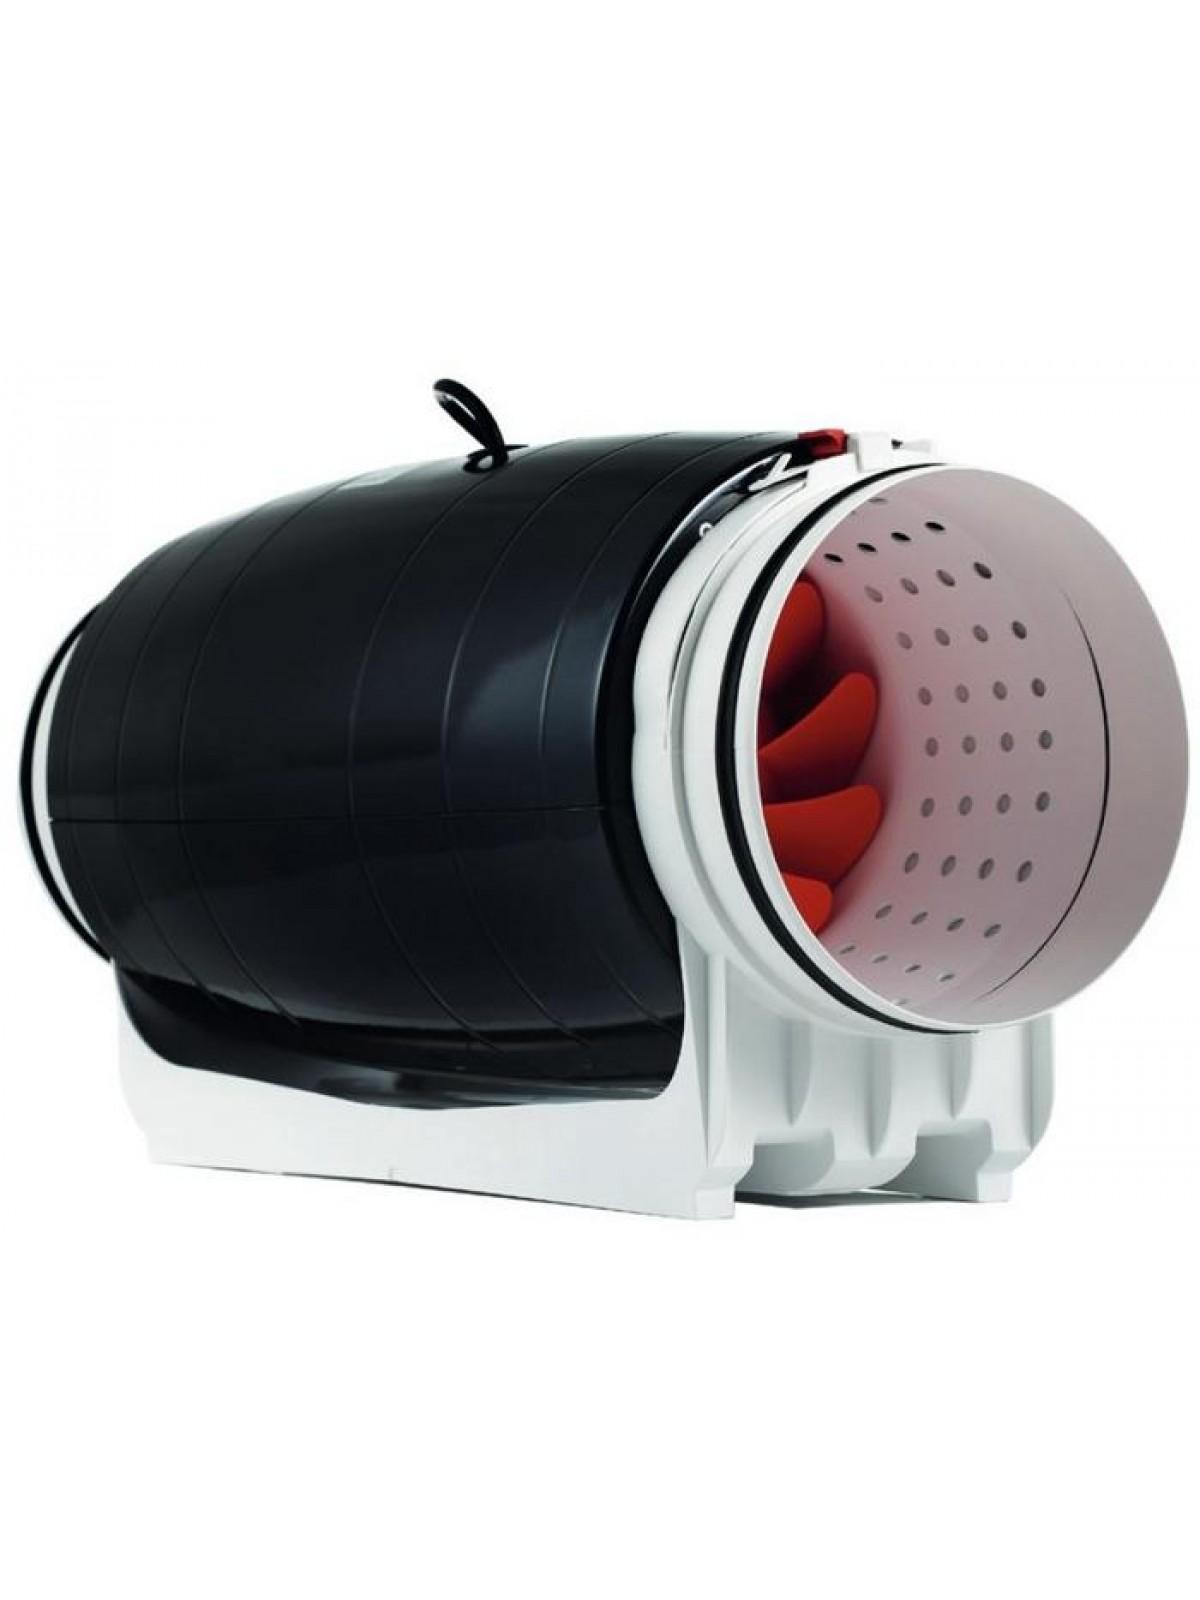 Монтаж канального вентилятора от 10000 до 50000 м3/ч